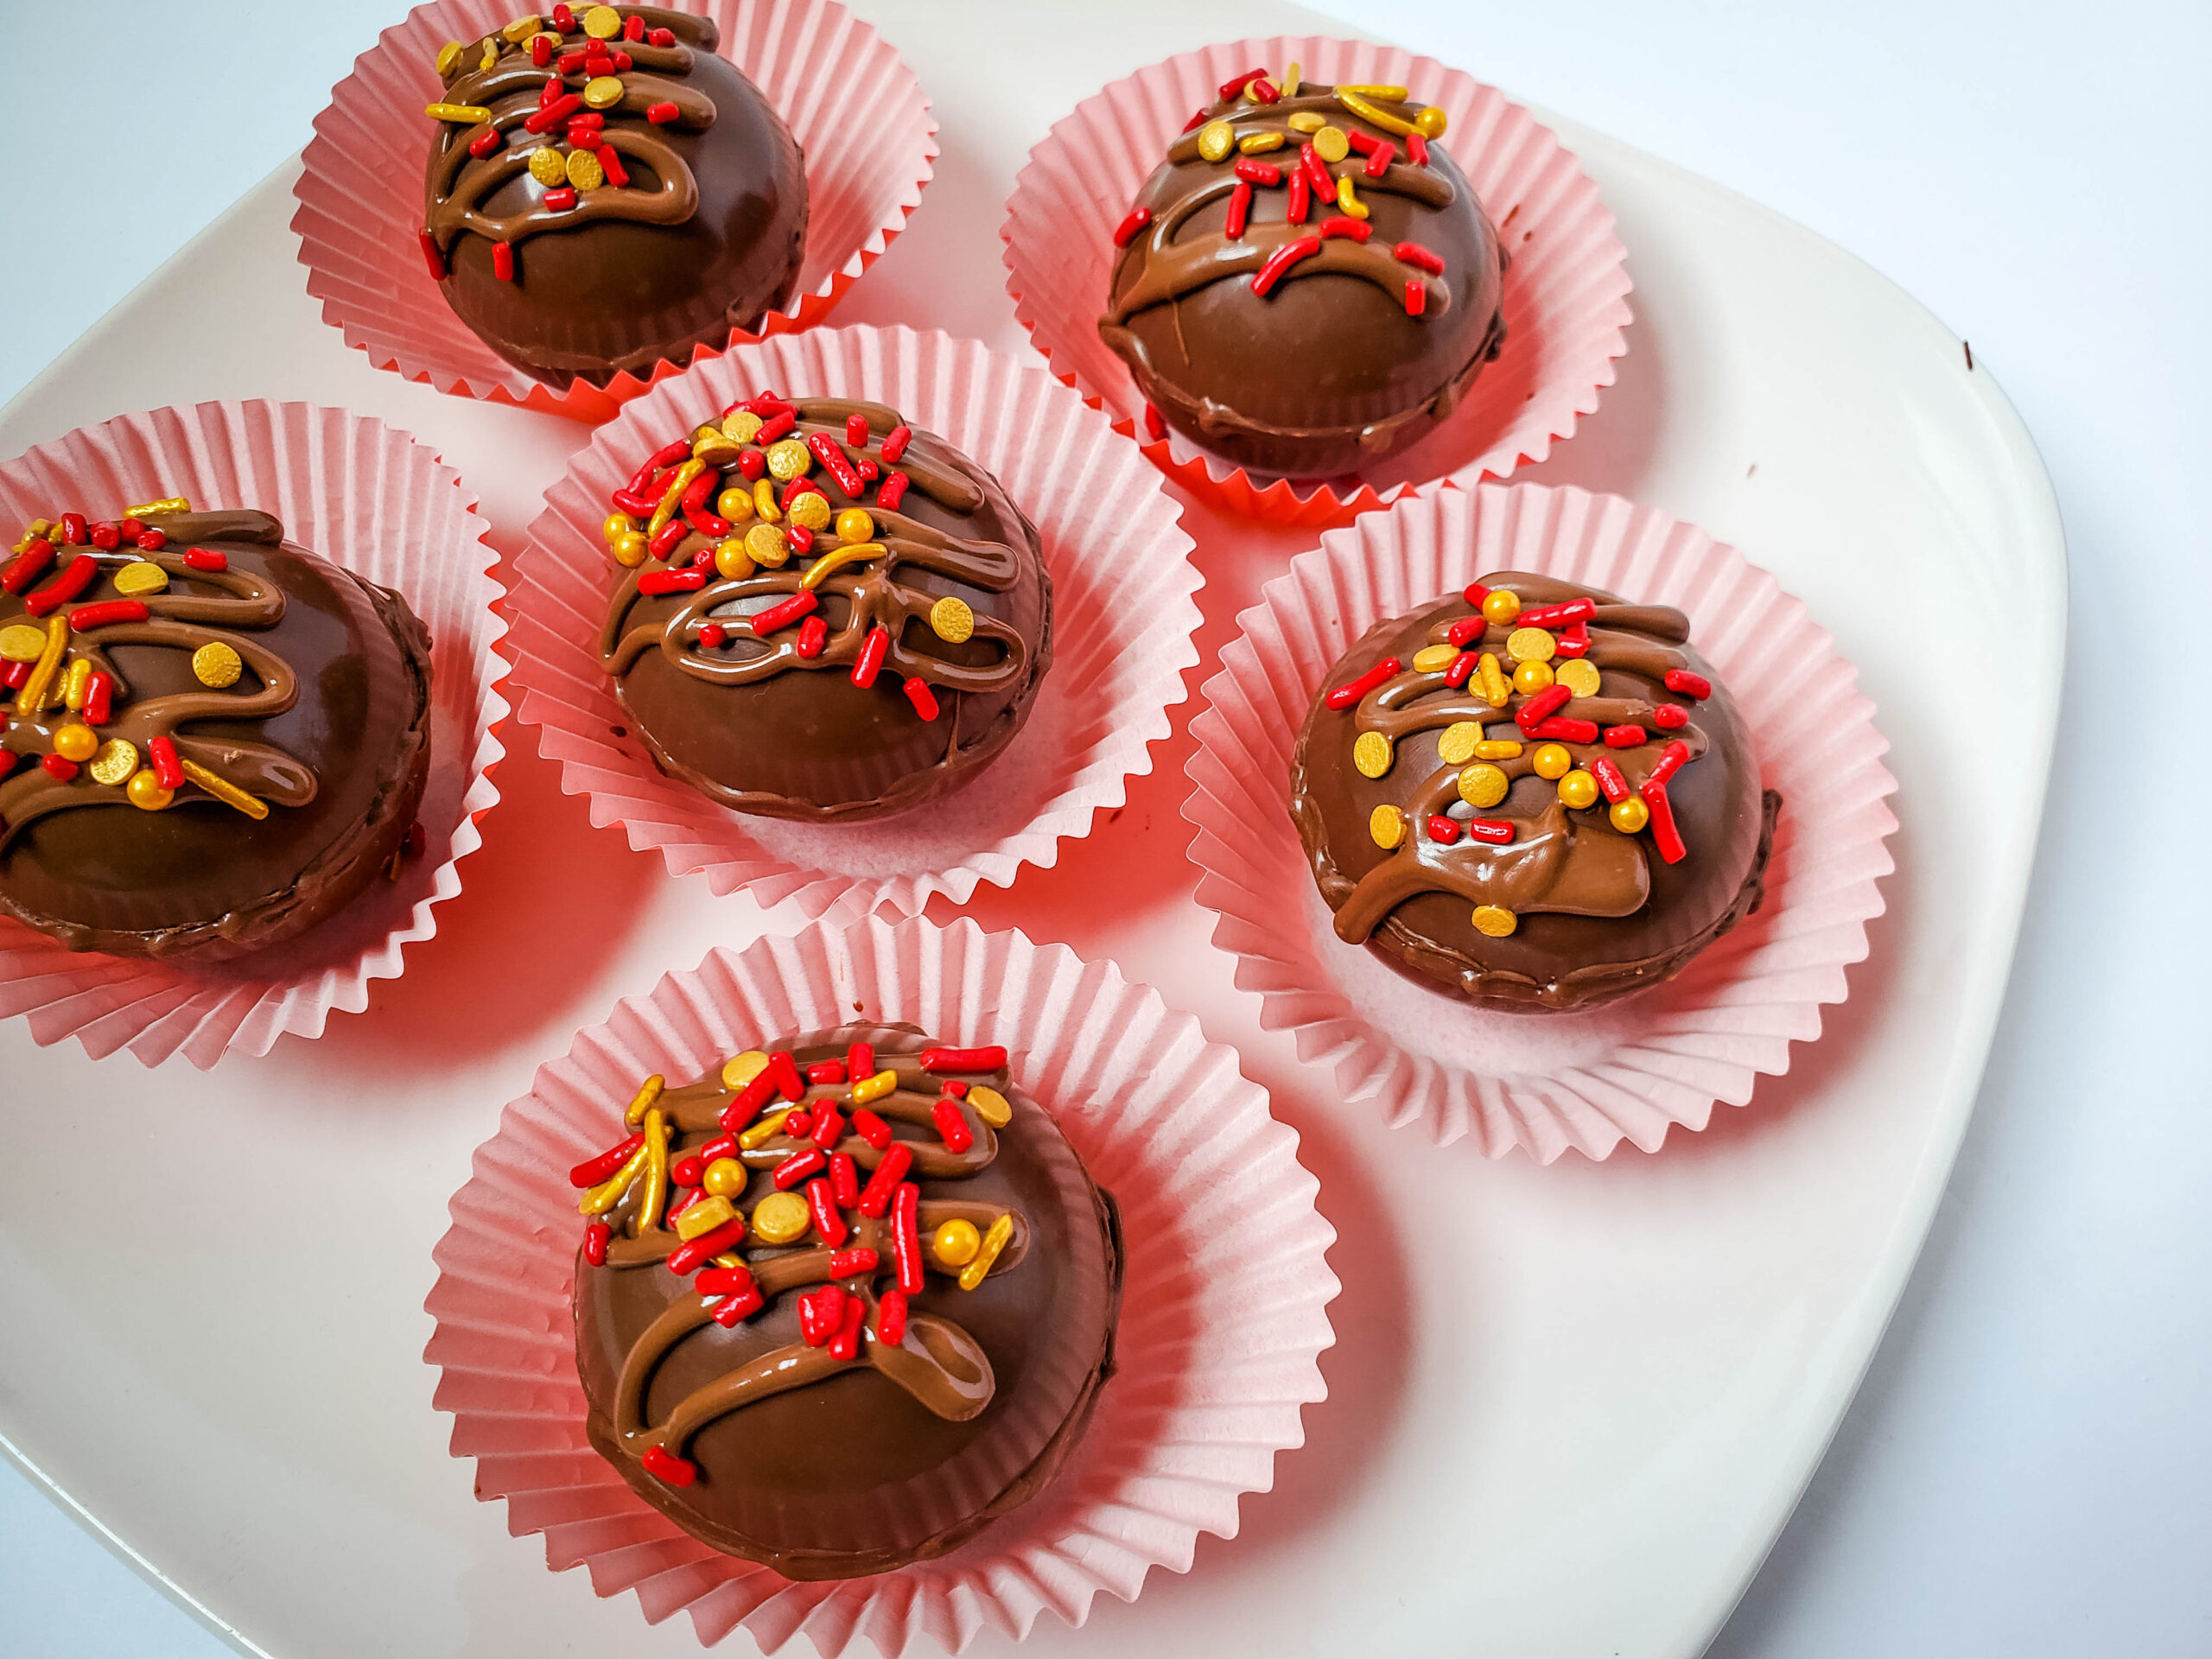 Hot Chocolate Fireball Bombs